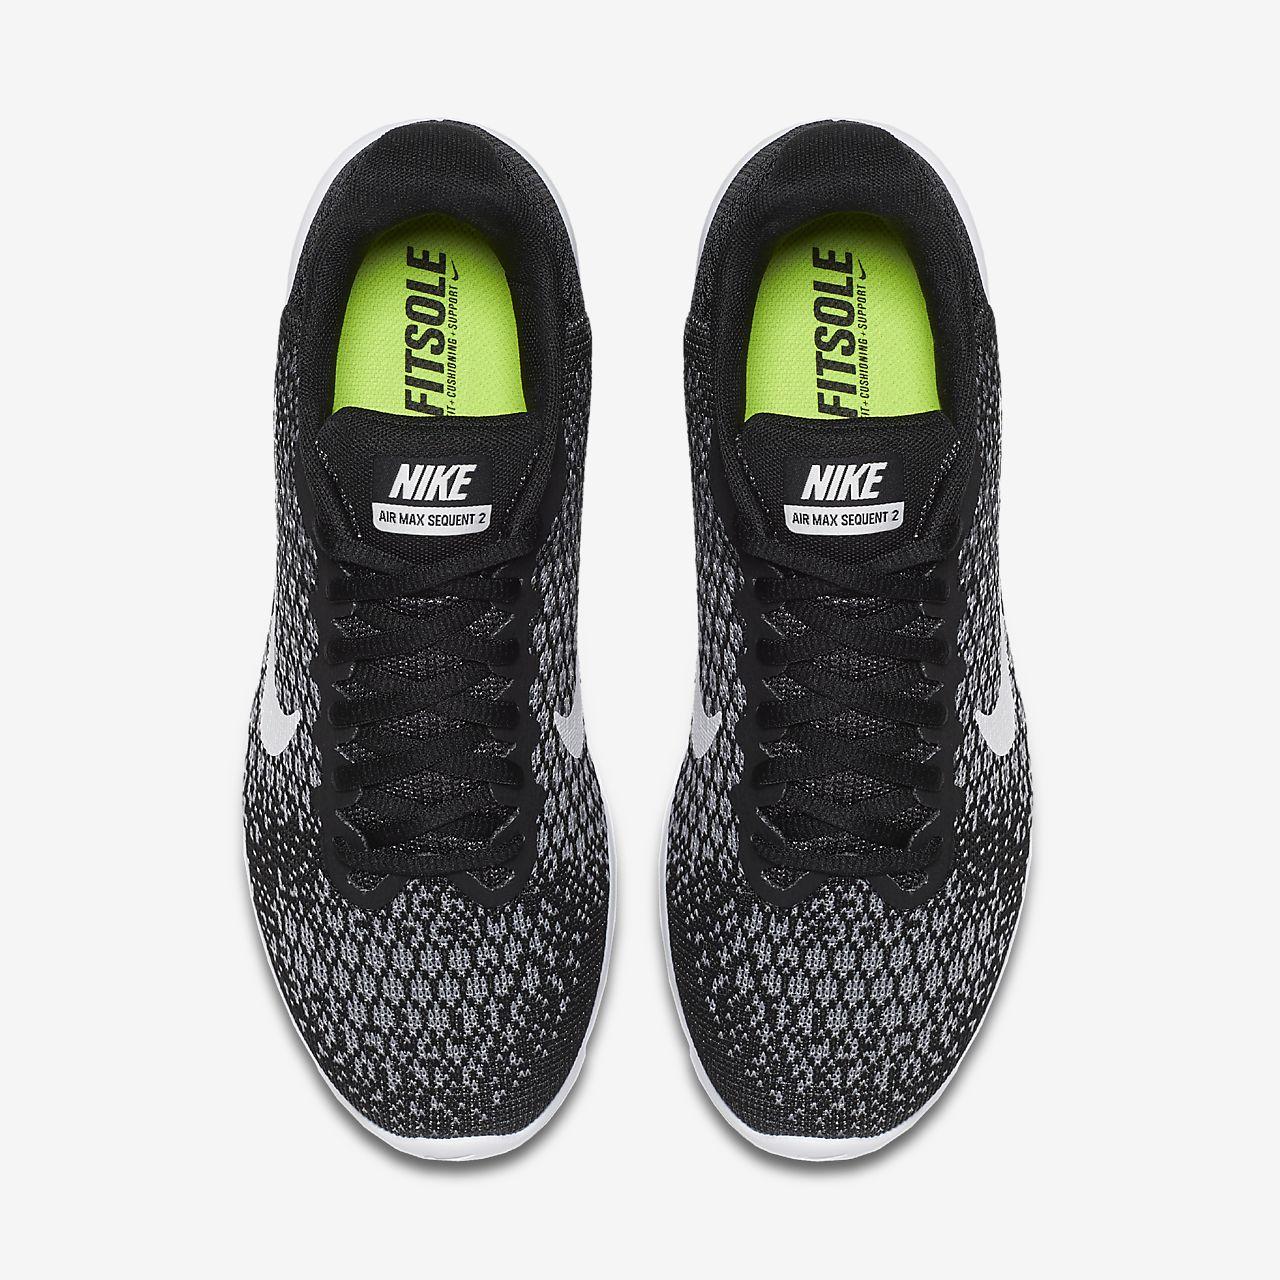 d4e7a5e7fc6 Nike Air Max Sequent 2 Women s Shoe. Nike.com FI